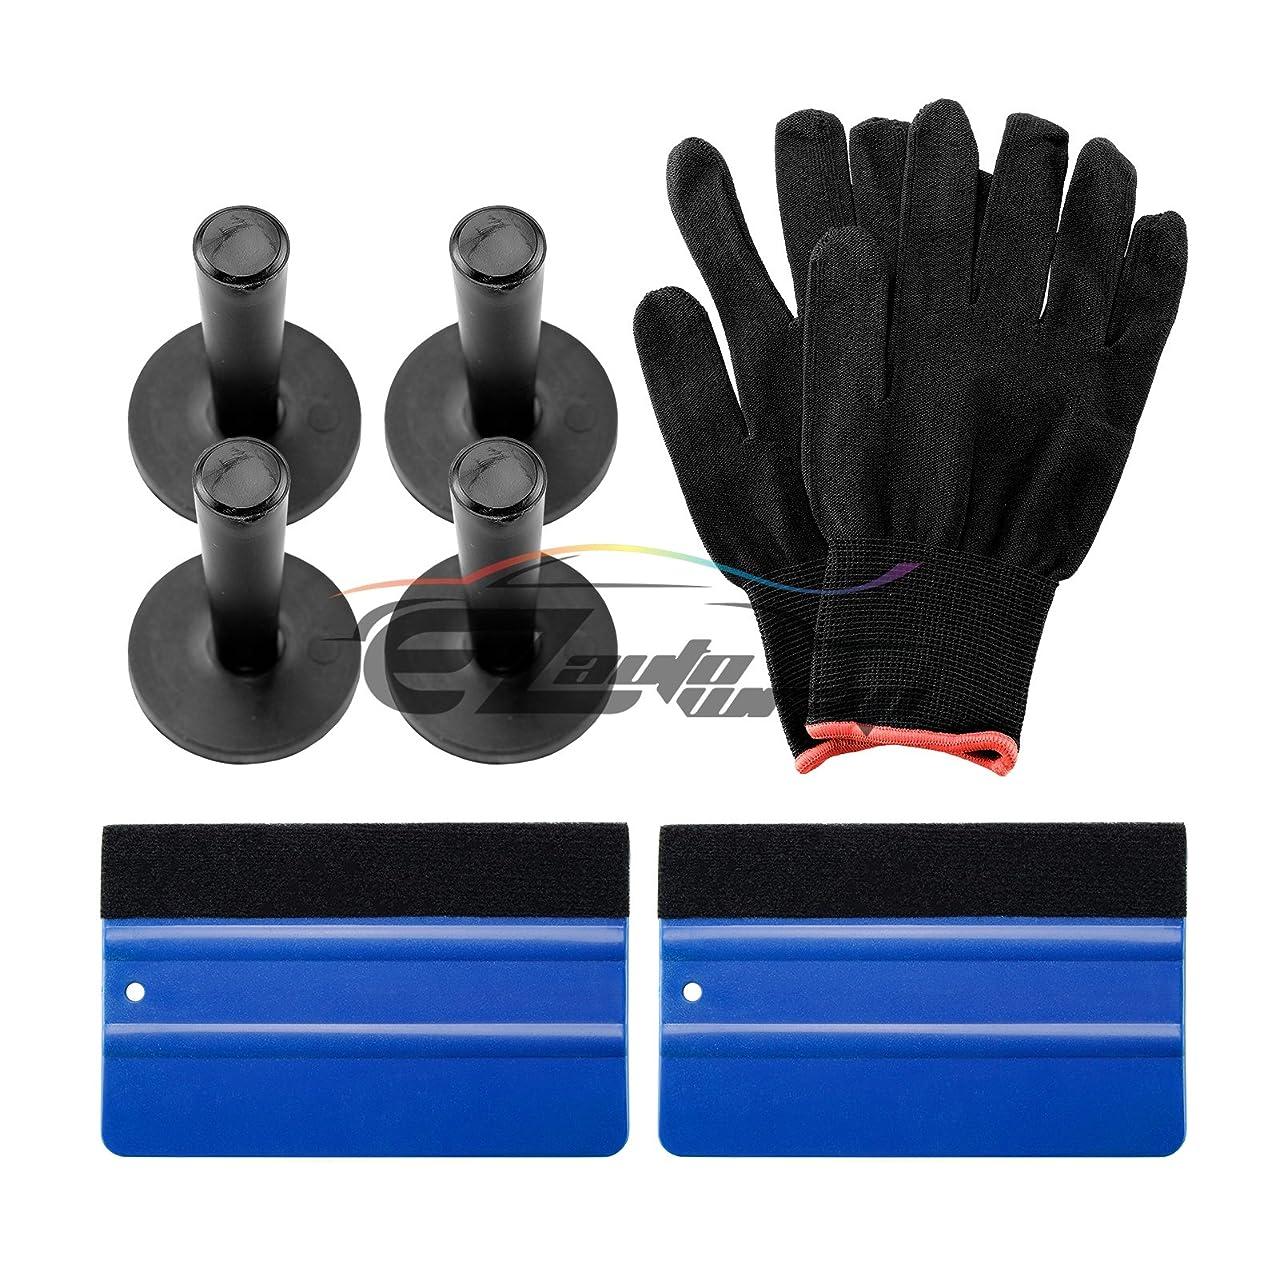 EZAUTOWRAP Professional Vinyl Wrap Tool Kit Window Tint Film Application Decal Sticker Premium Quality Blue Felt Squeegees Wrapping Glove Magnets TK02